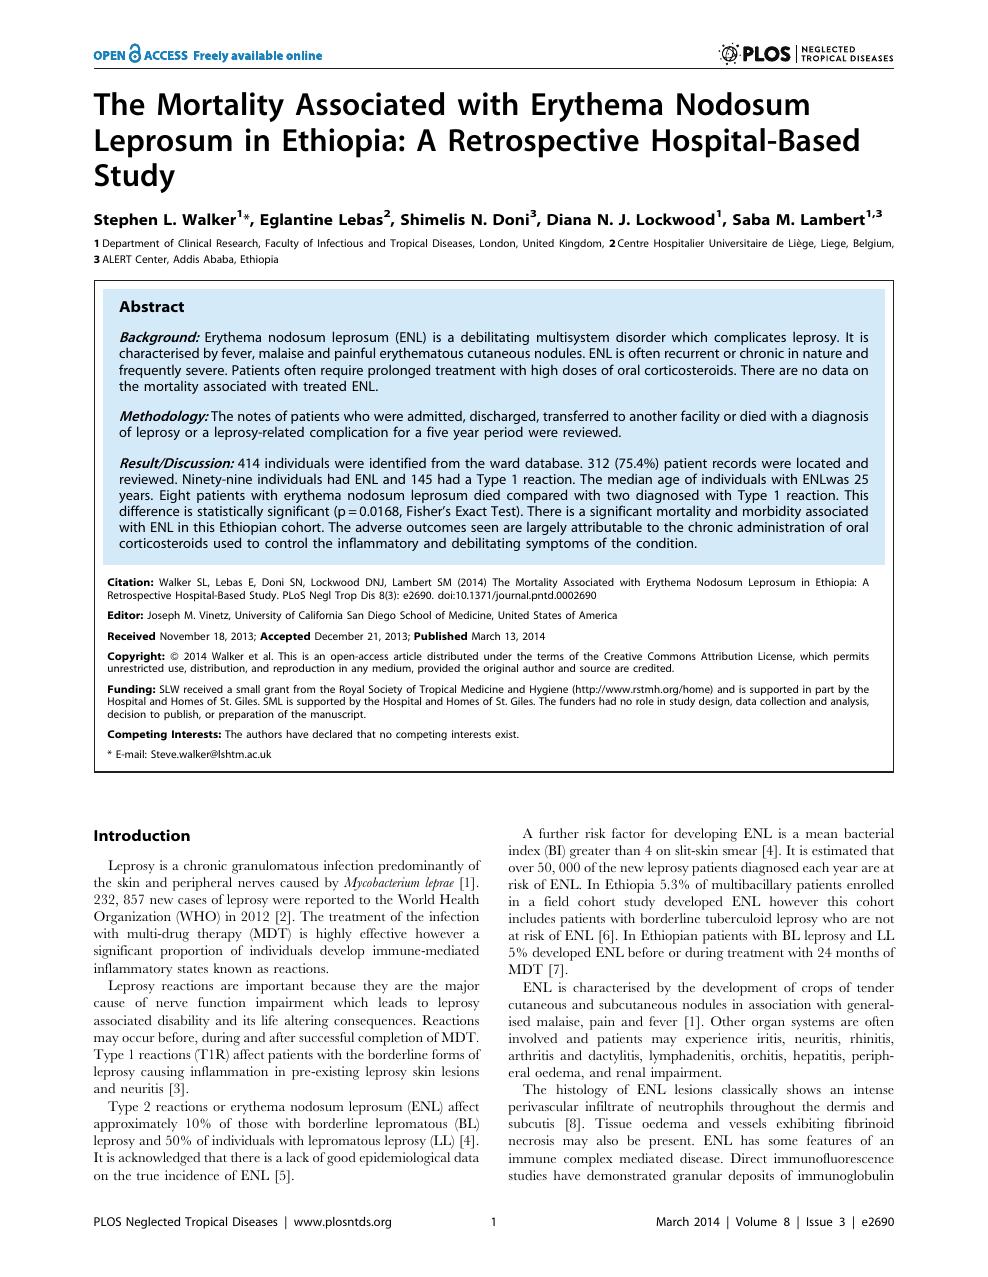 The Mortality Associated with Erythema Nodosum Leprosum in